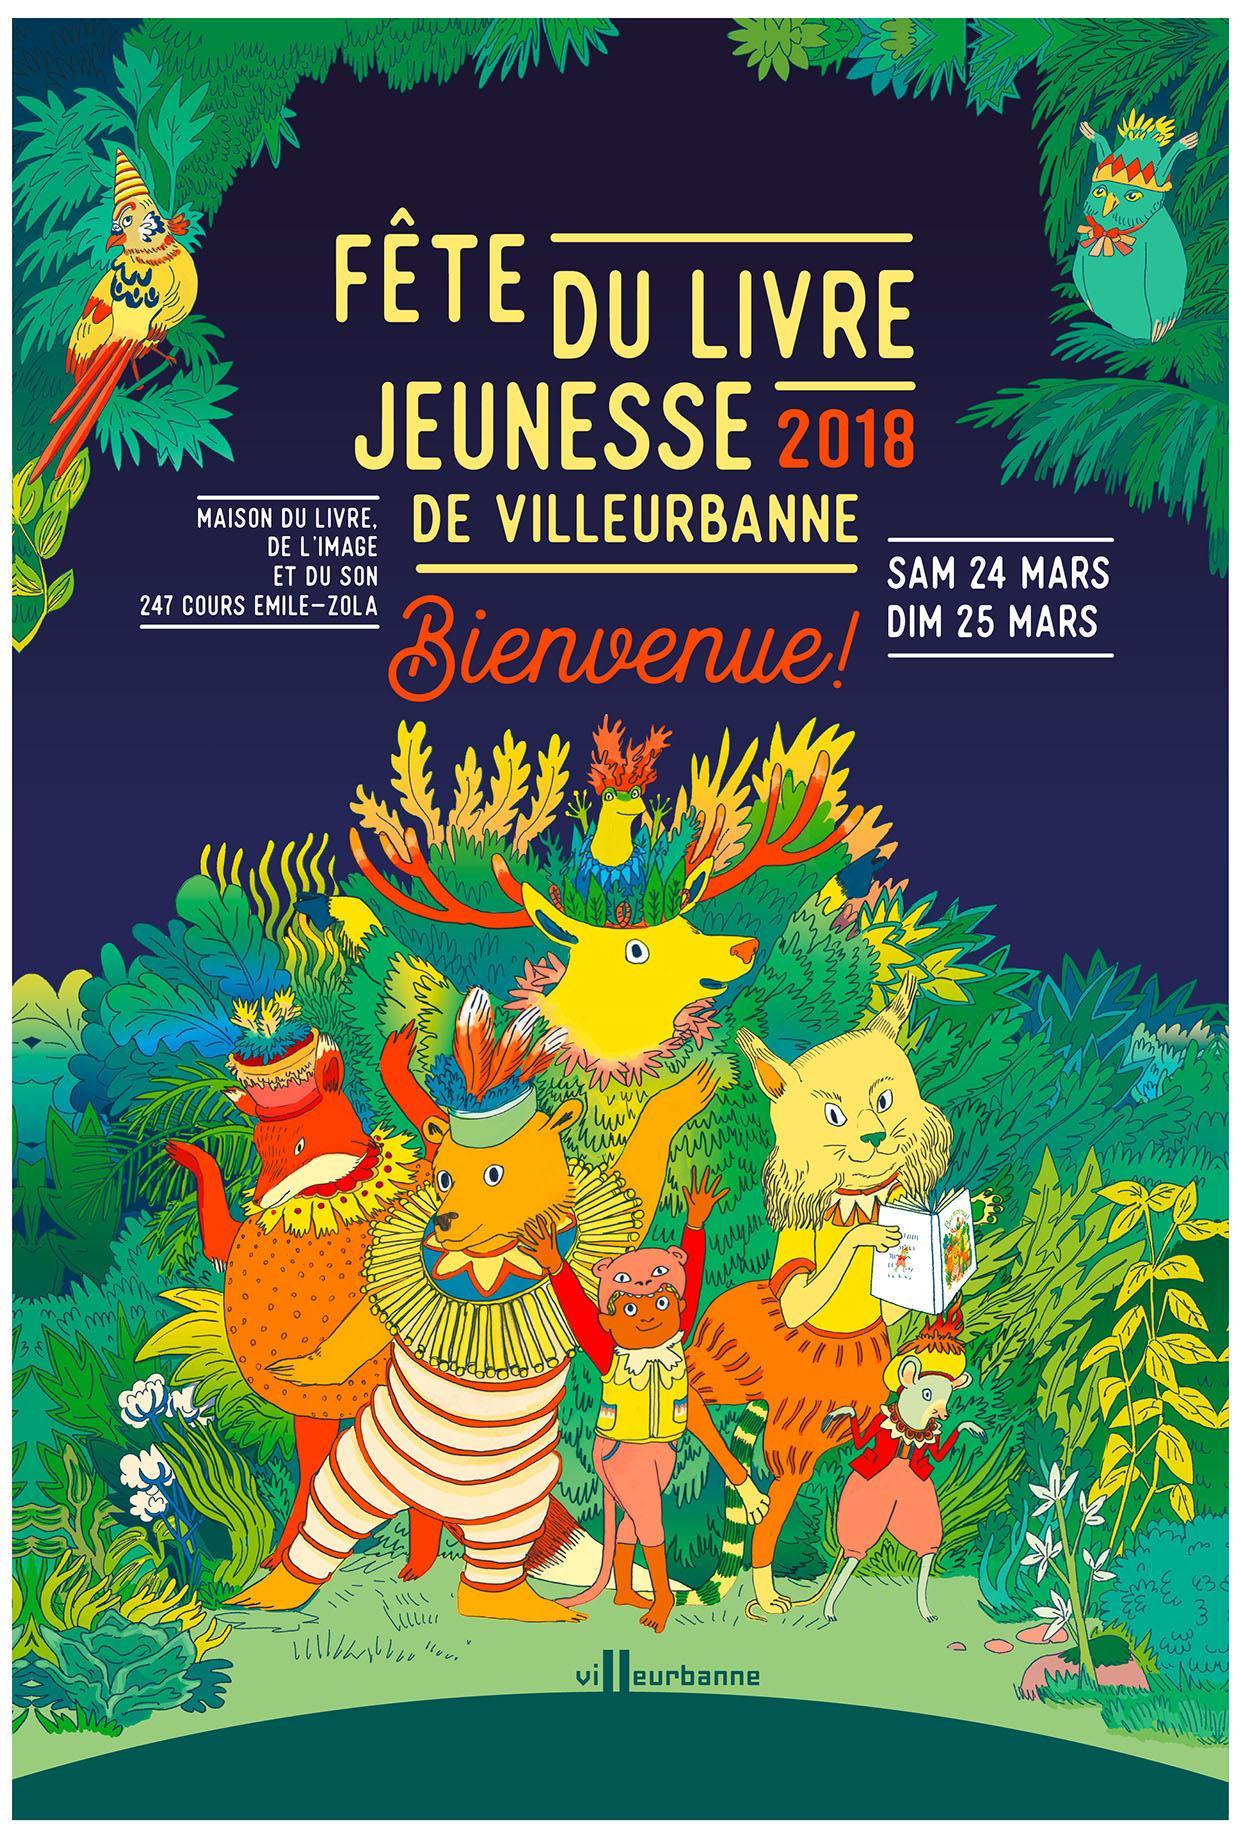 Fete Du Livre Jeunesse 2018 Villeurbanne Artistikrezo